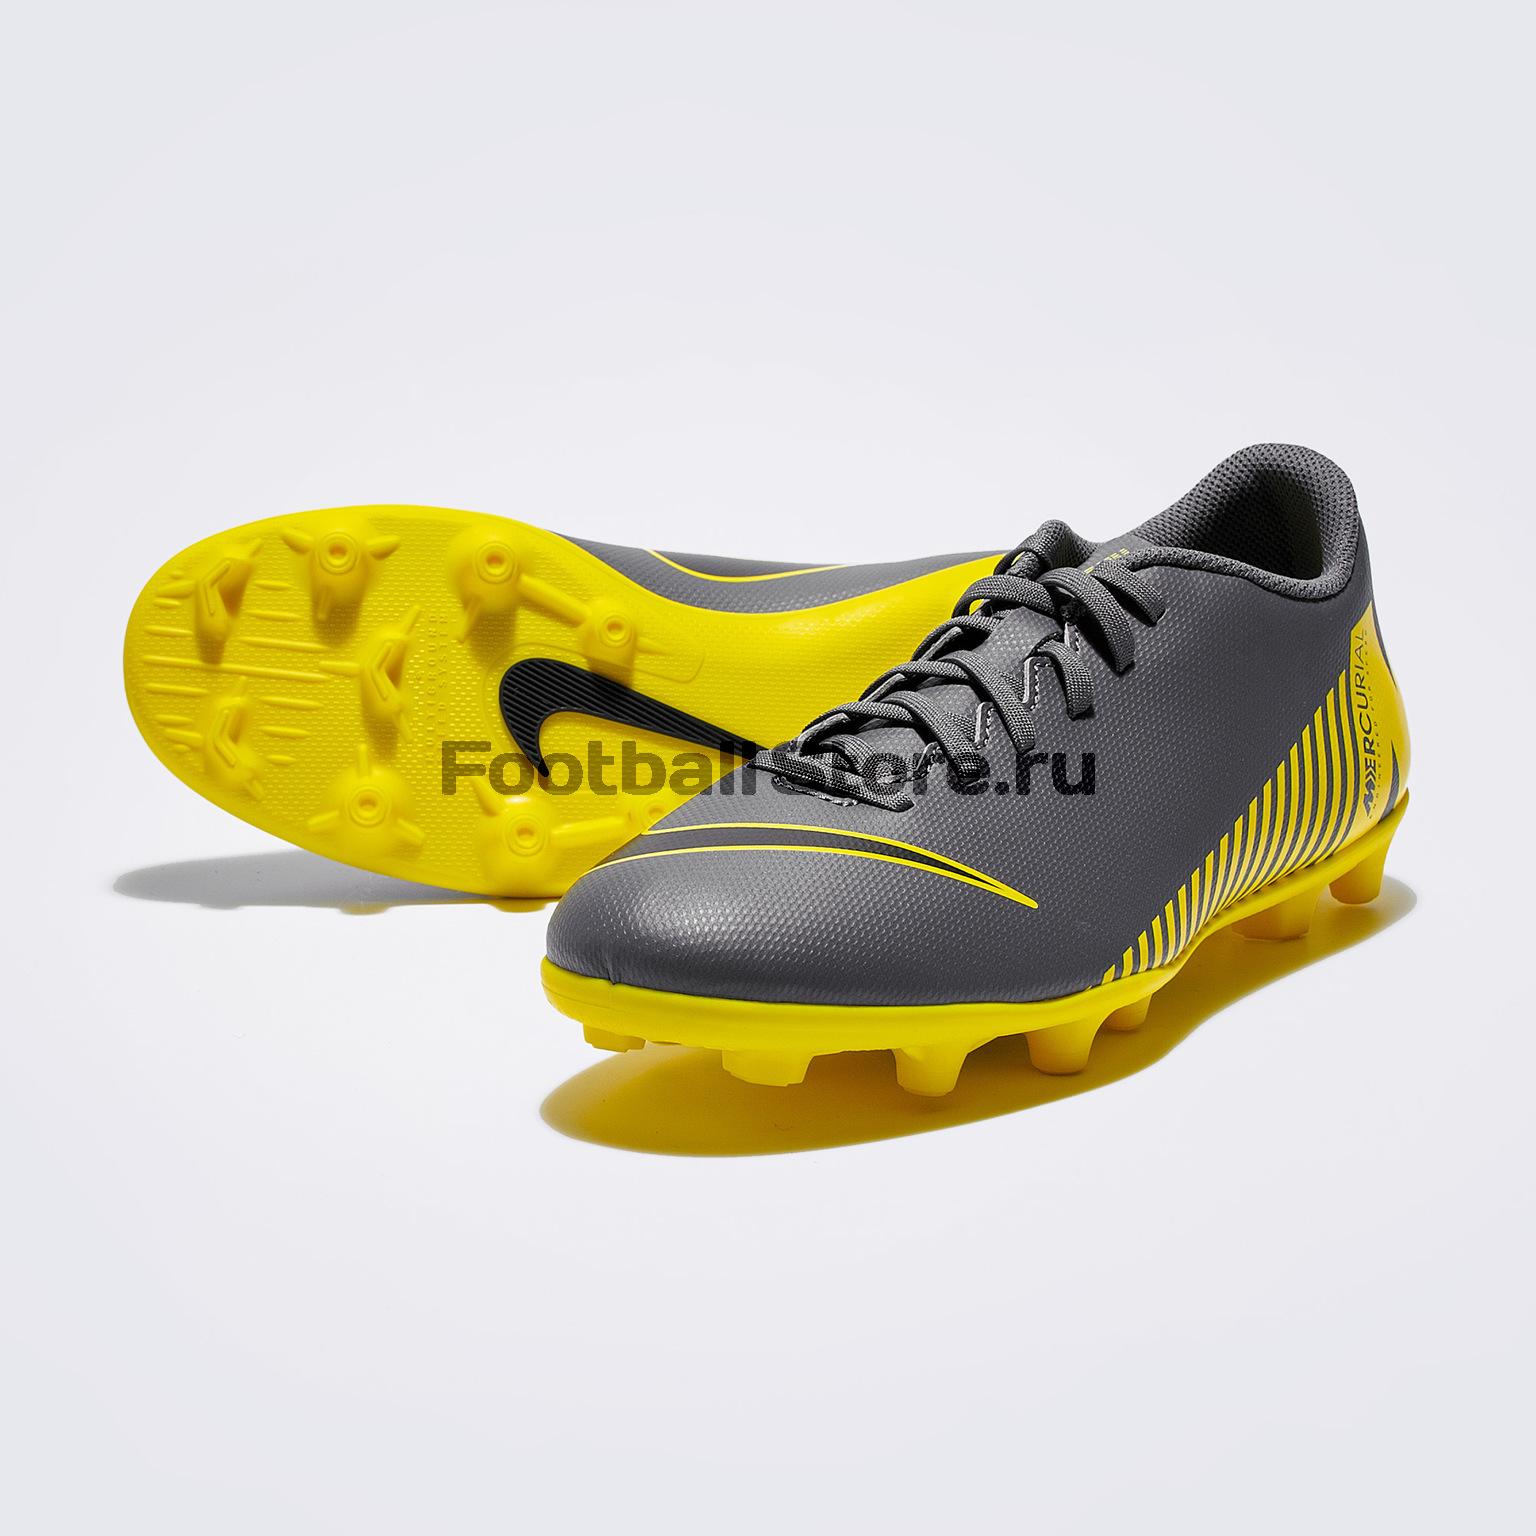 Бутсы Nike Vapor 12 Club FG/MG AH7378-070 бутсы детские nike vapor 12 academy gs fg mg ah7347 070